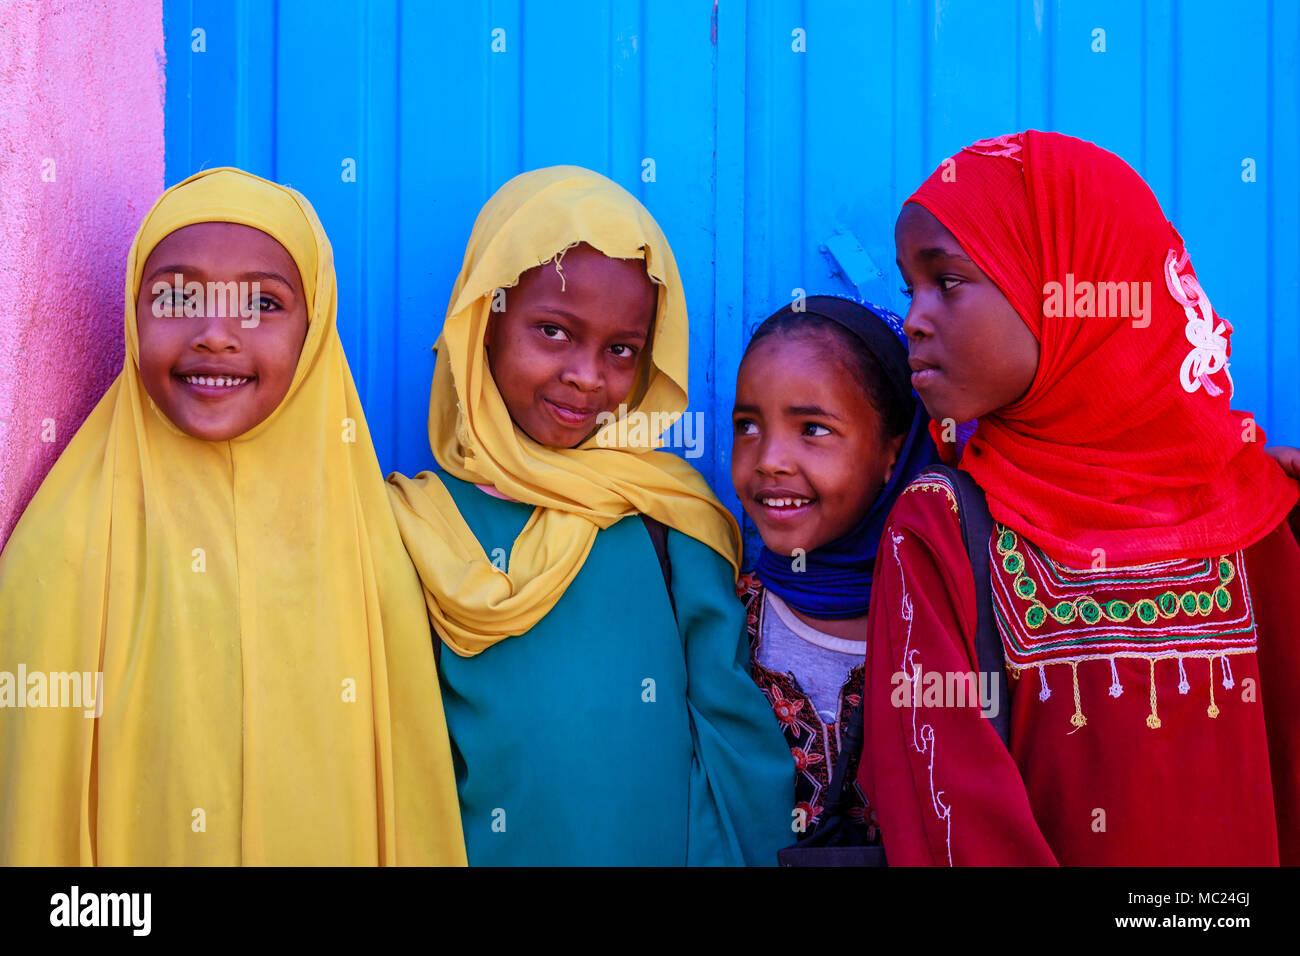 Ethiopian Schoolchildren, Harar, Ethiopia - Stock Image